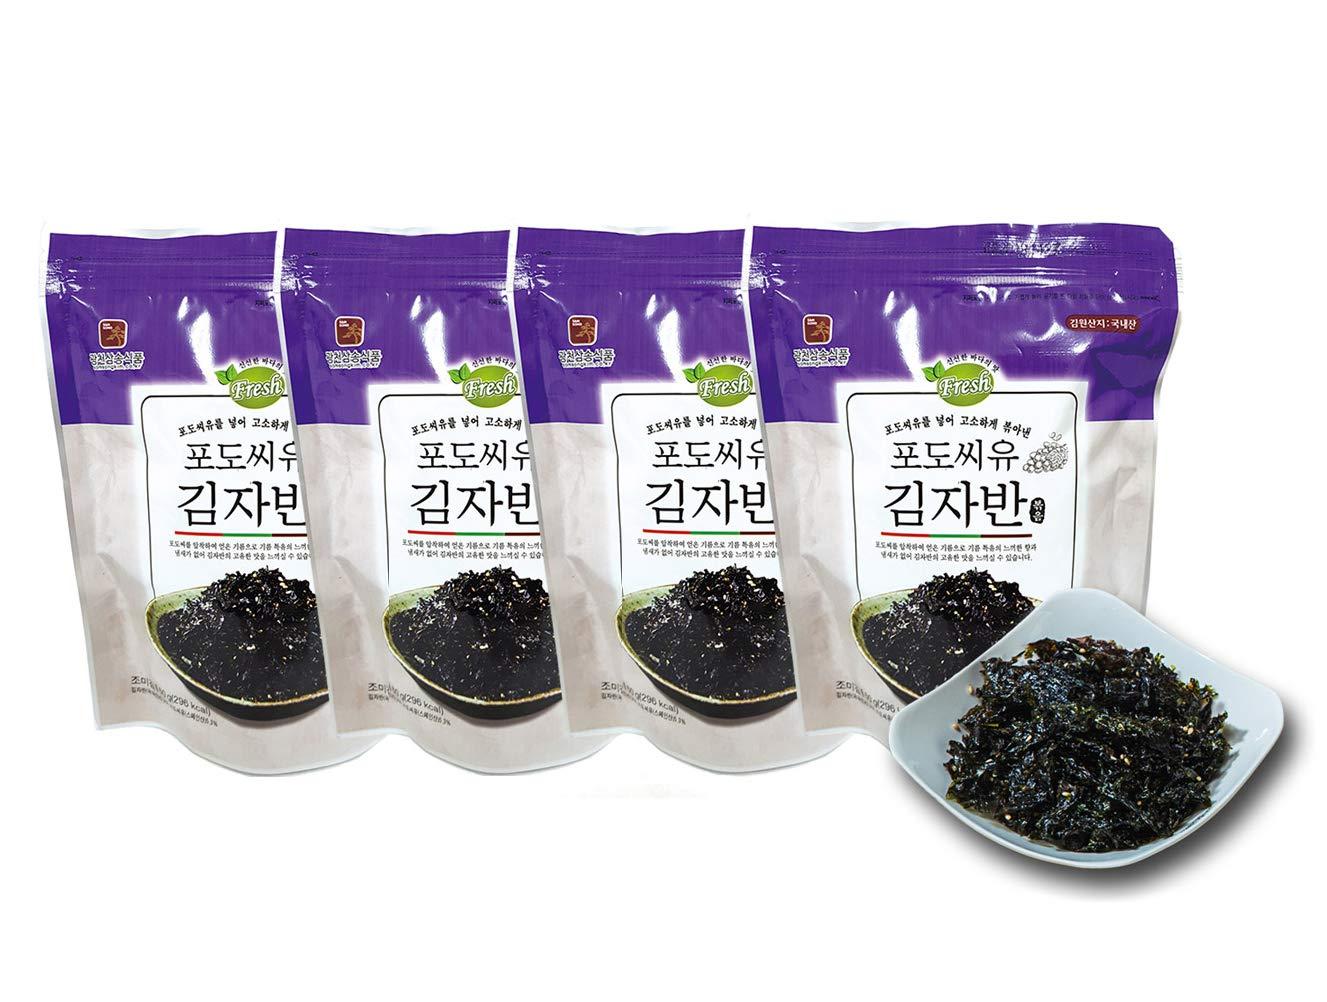 Premium All Natural Original Korean Roasted Seasoned Crispy Seaweed Flakes 2.1 oz (4 Pack) Gim Nori Laver Healthy Vegan Snacks Non-GMO Gluten Free